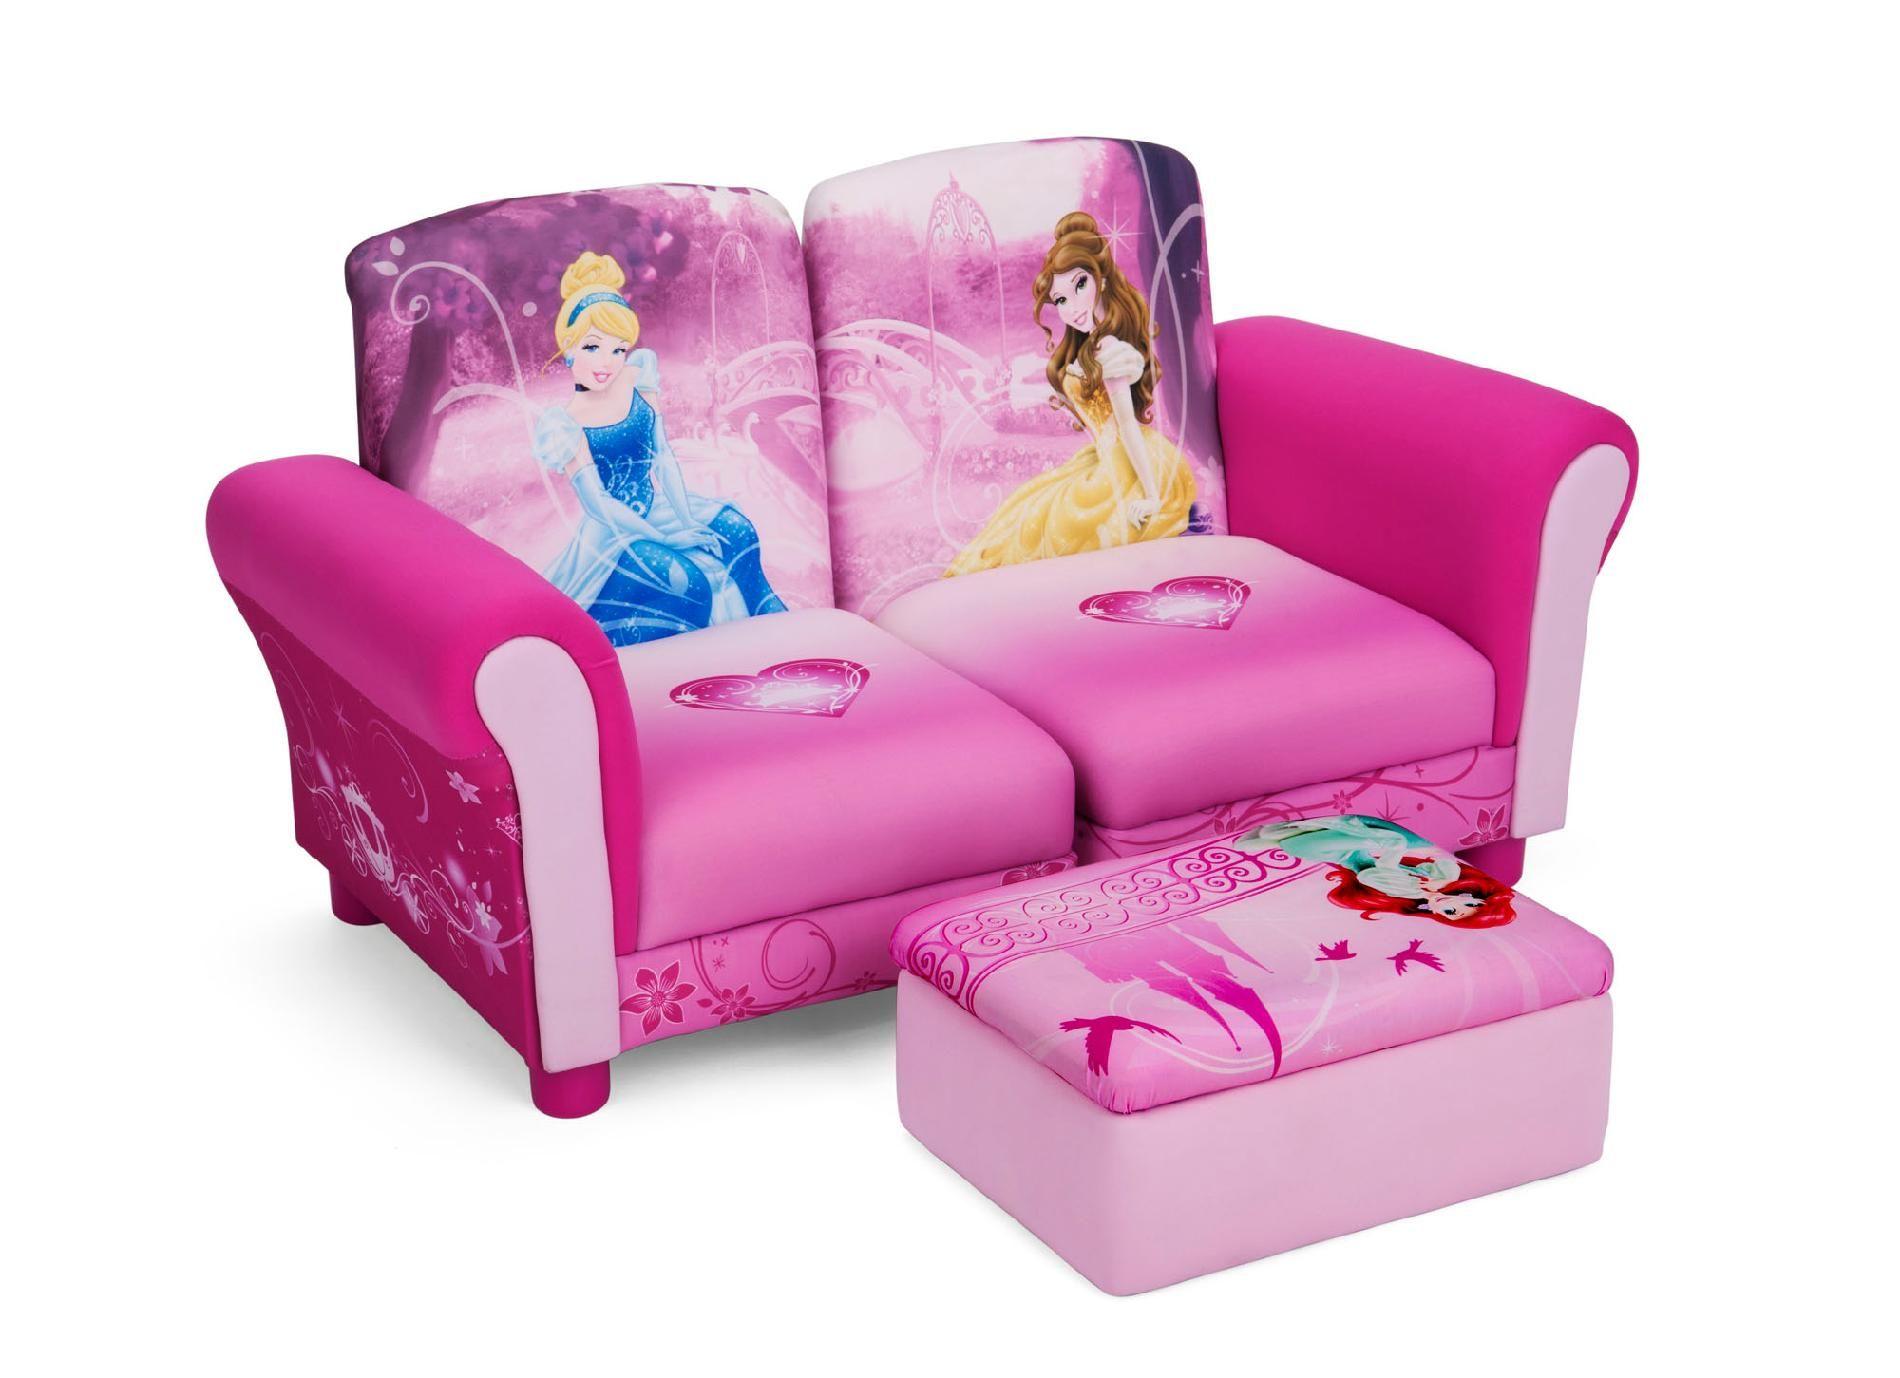 Delta childrens disney princess 3 pc upholstered baby